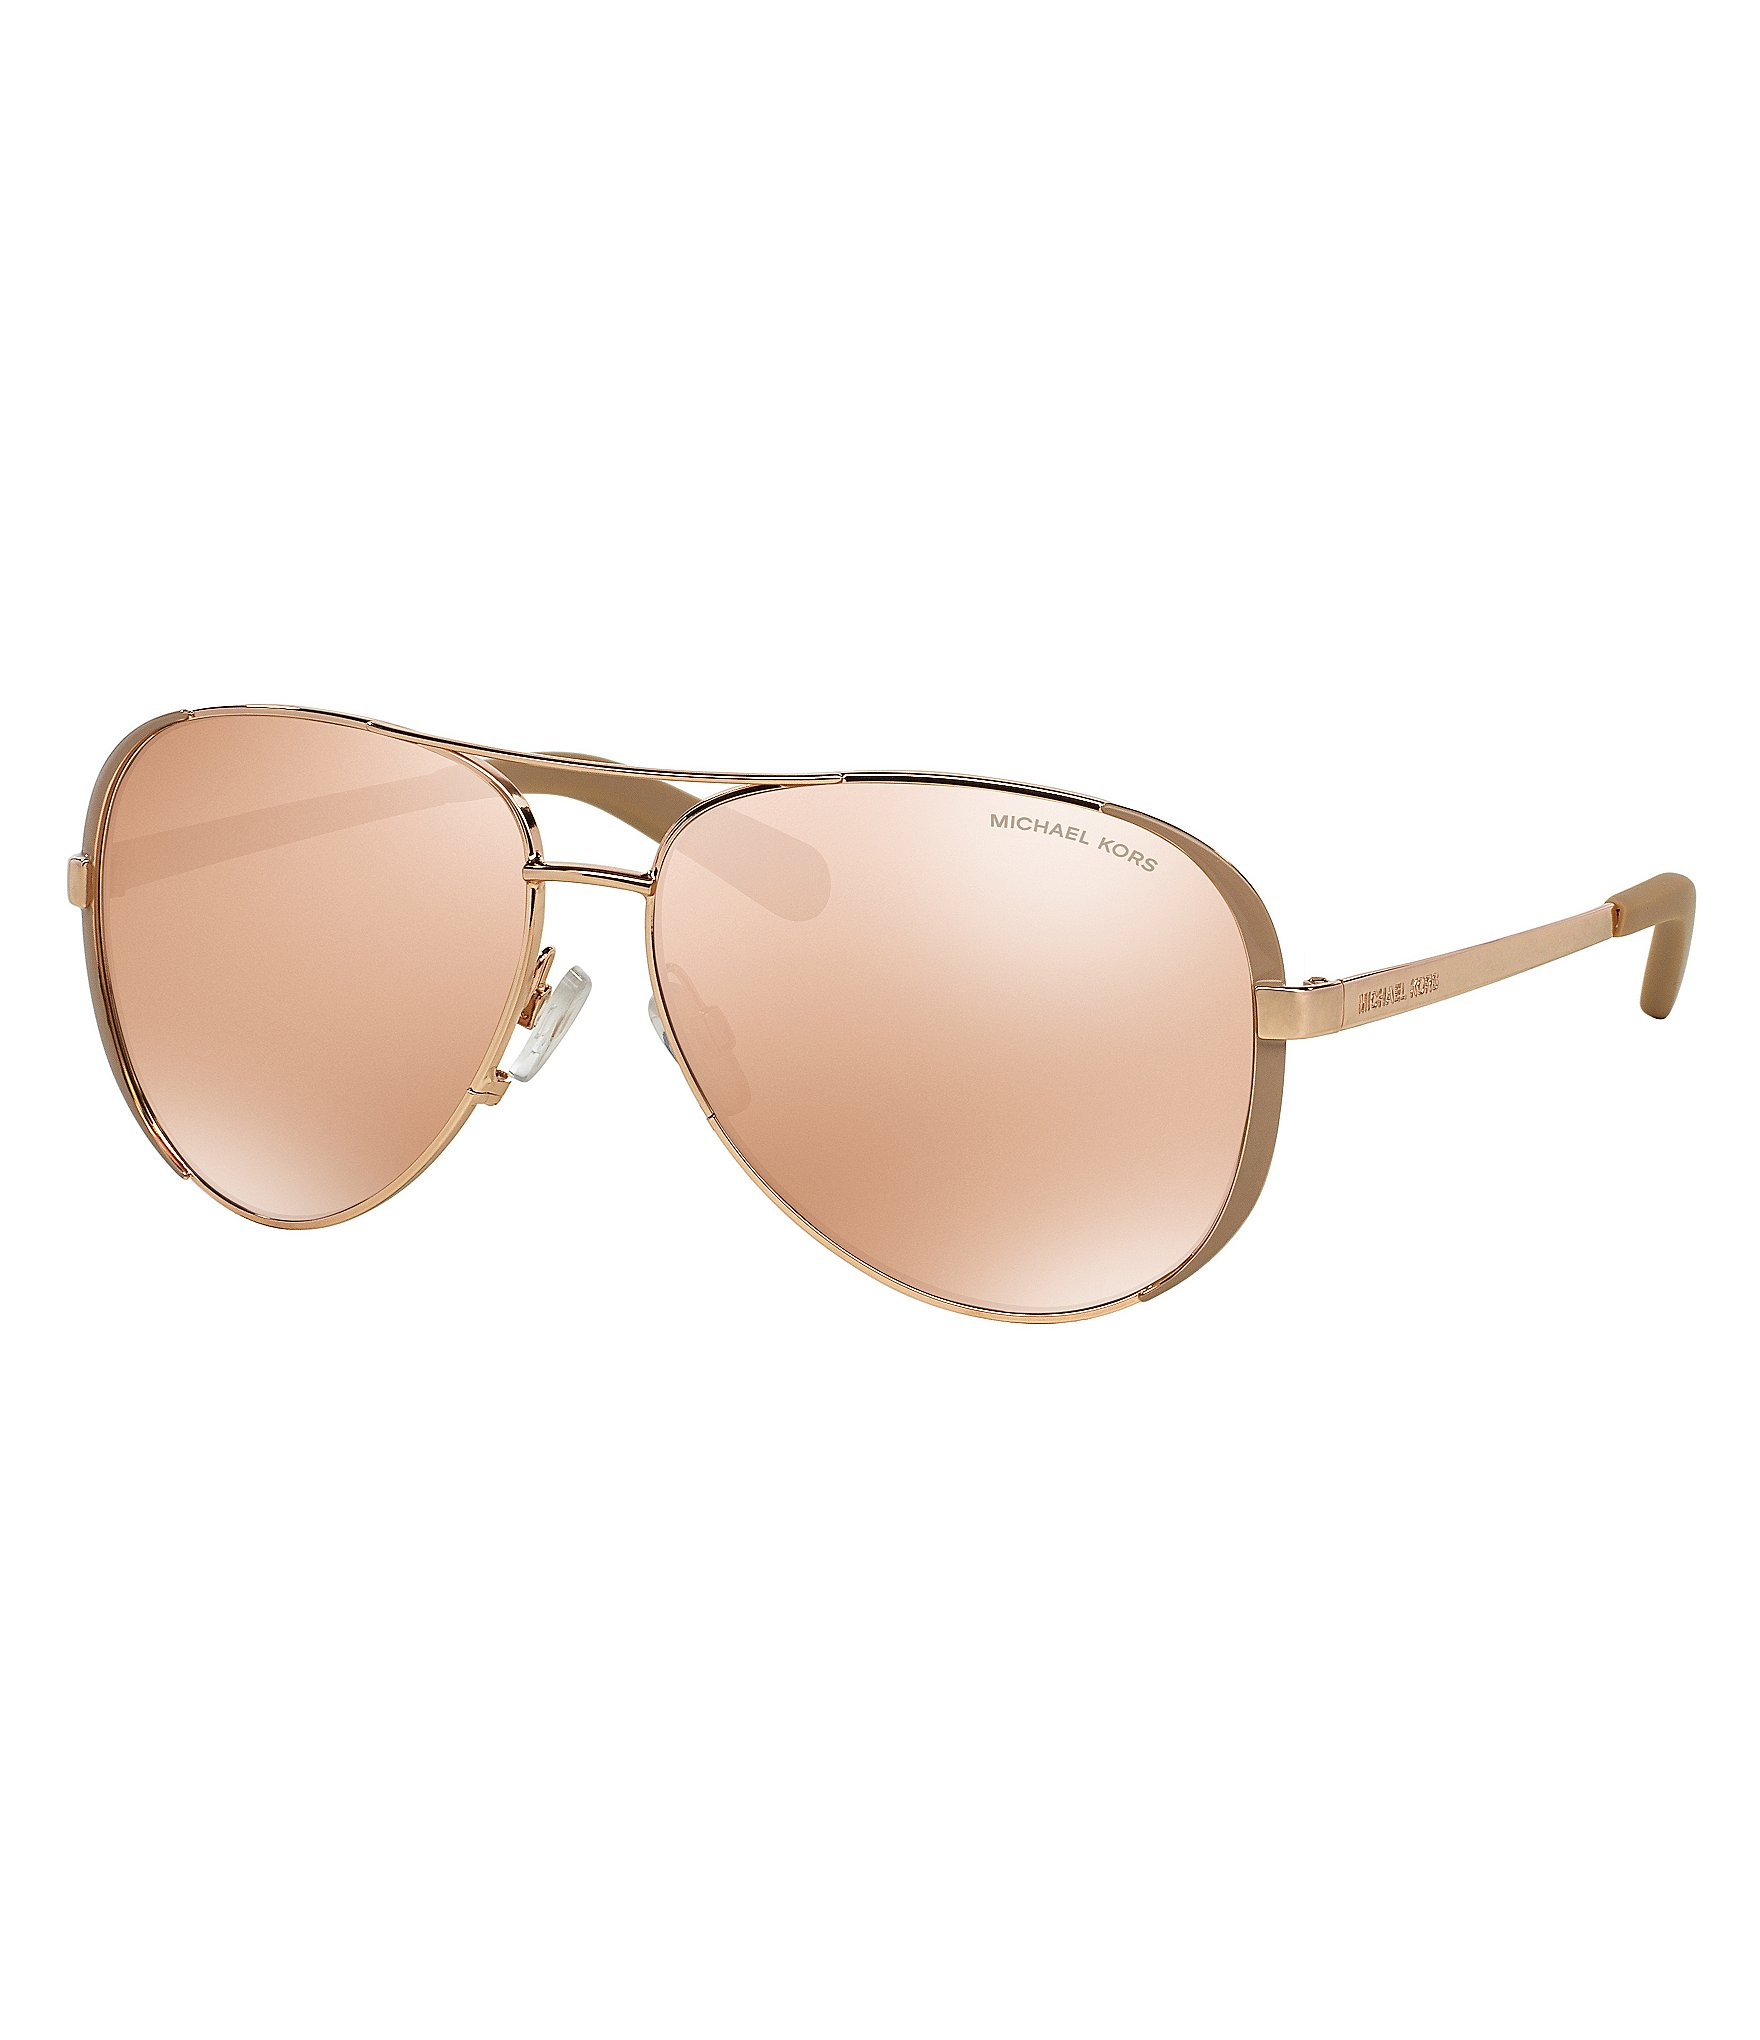 Michael Kors Sunglasses & Eyewear | Dillards